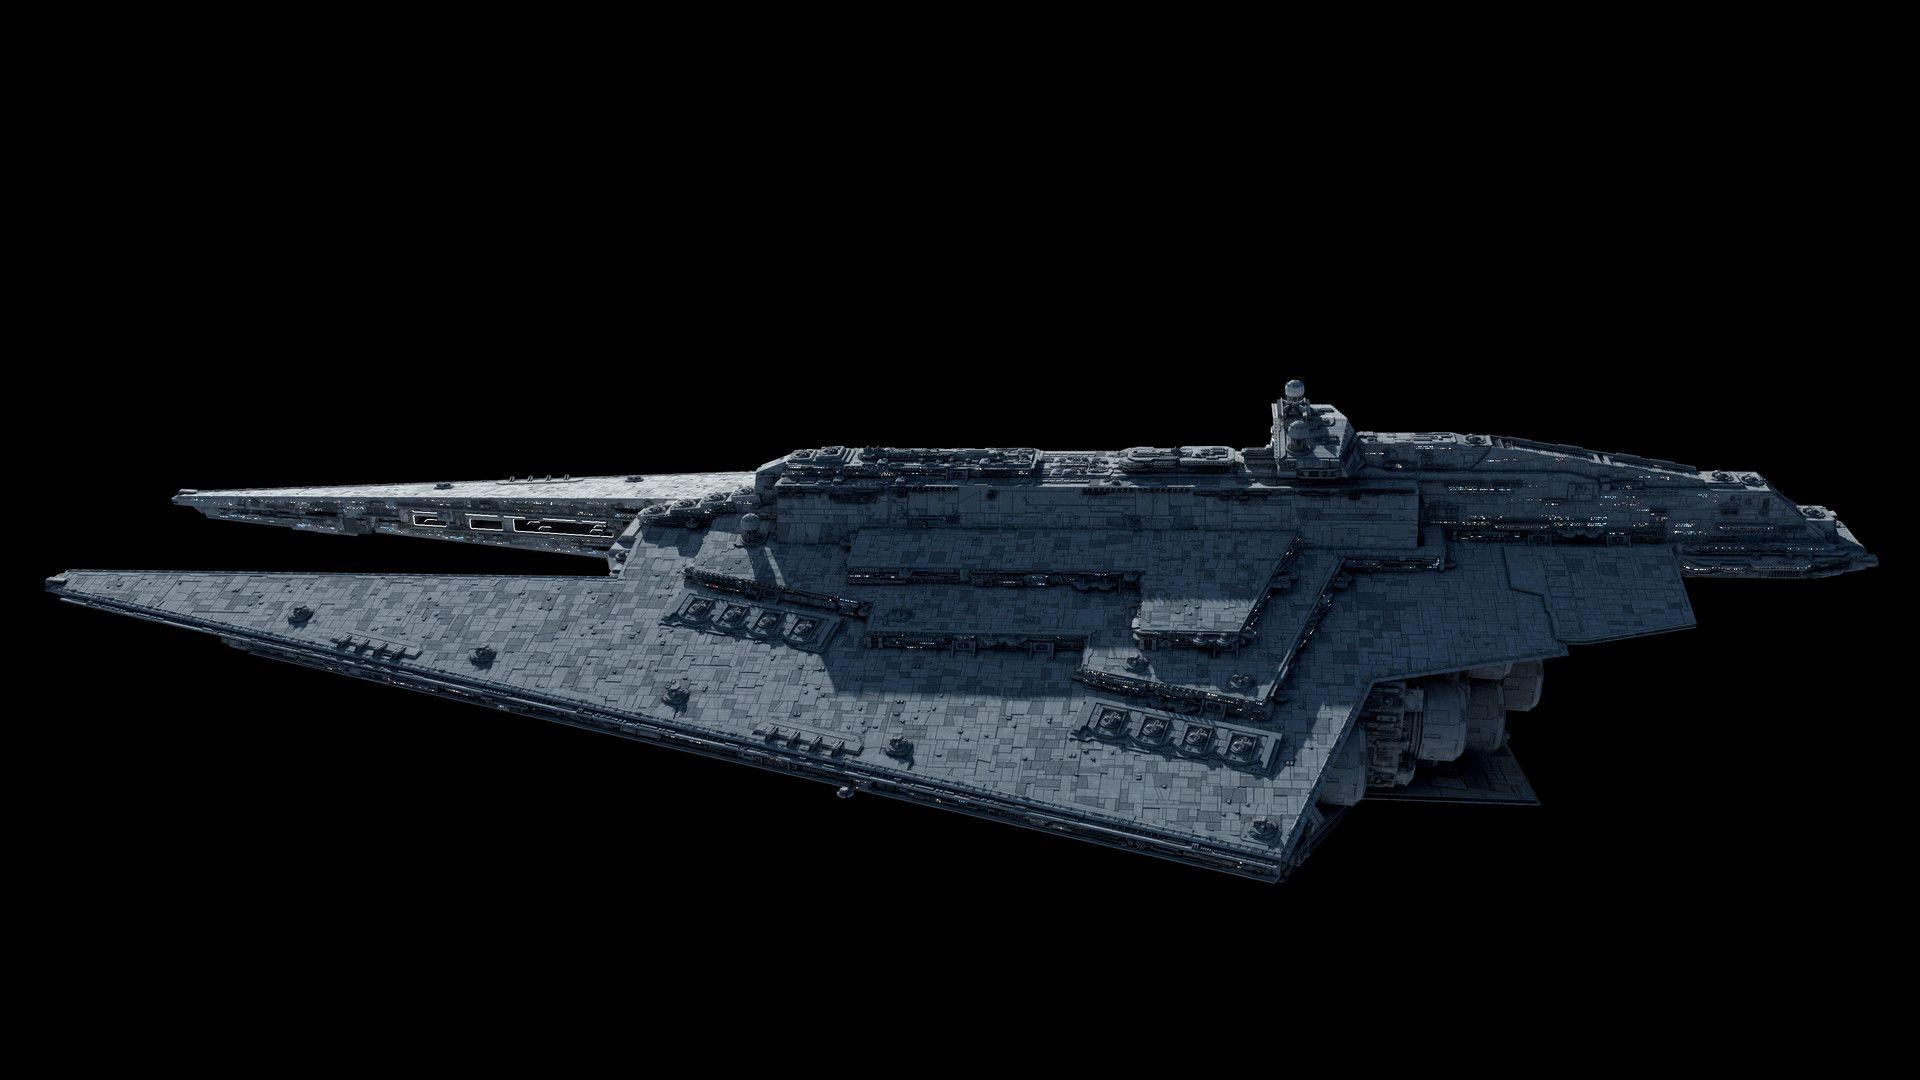 4k Star Wars Concept Art